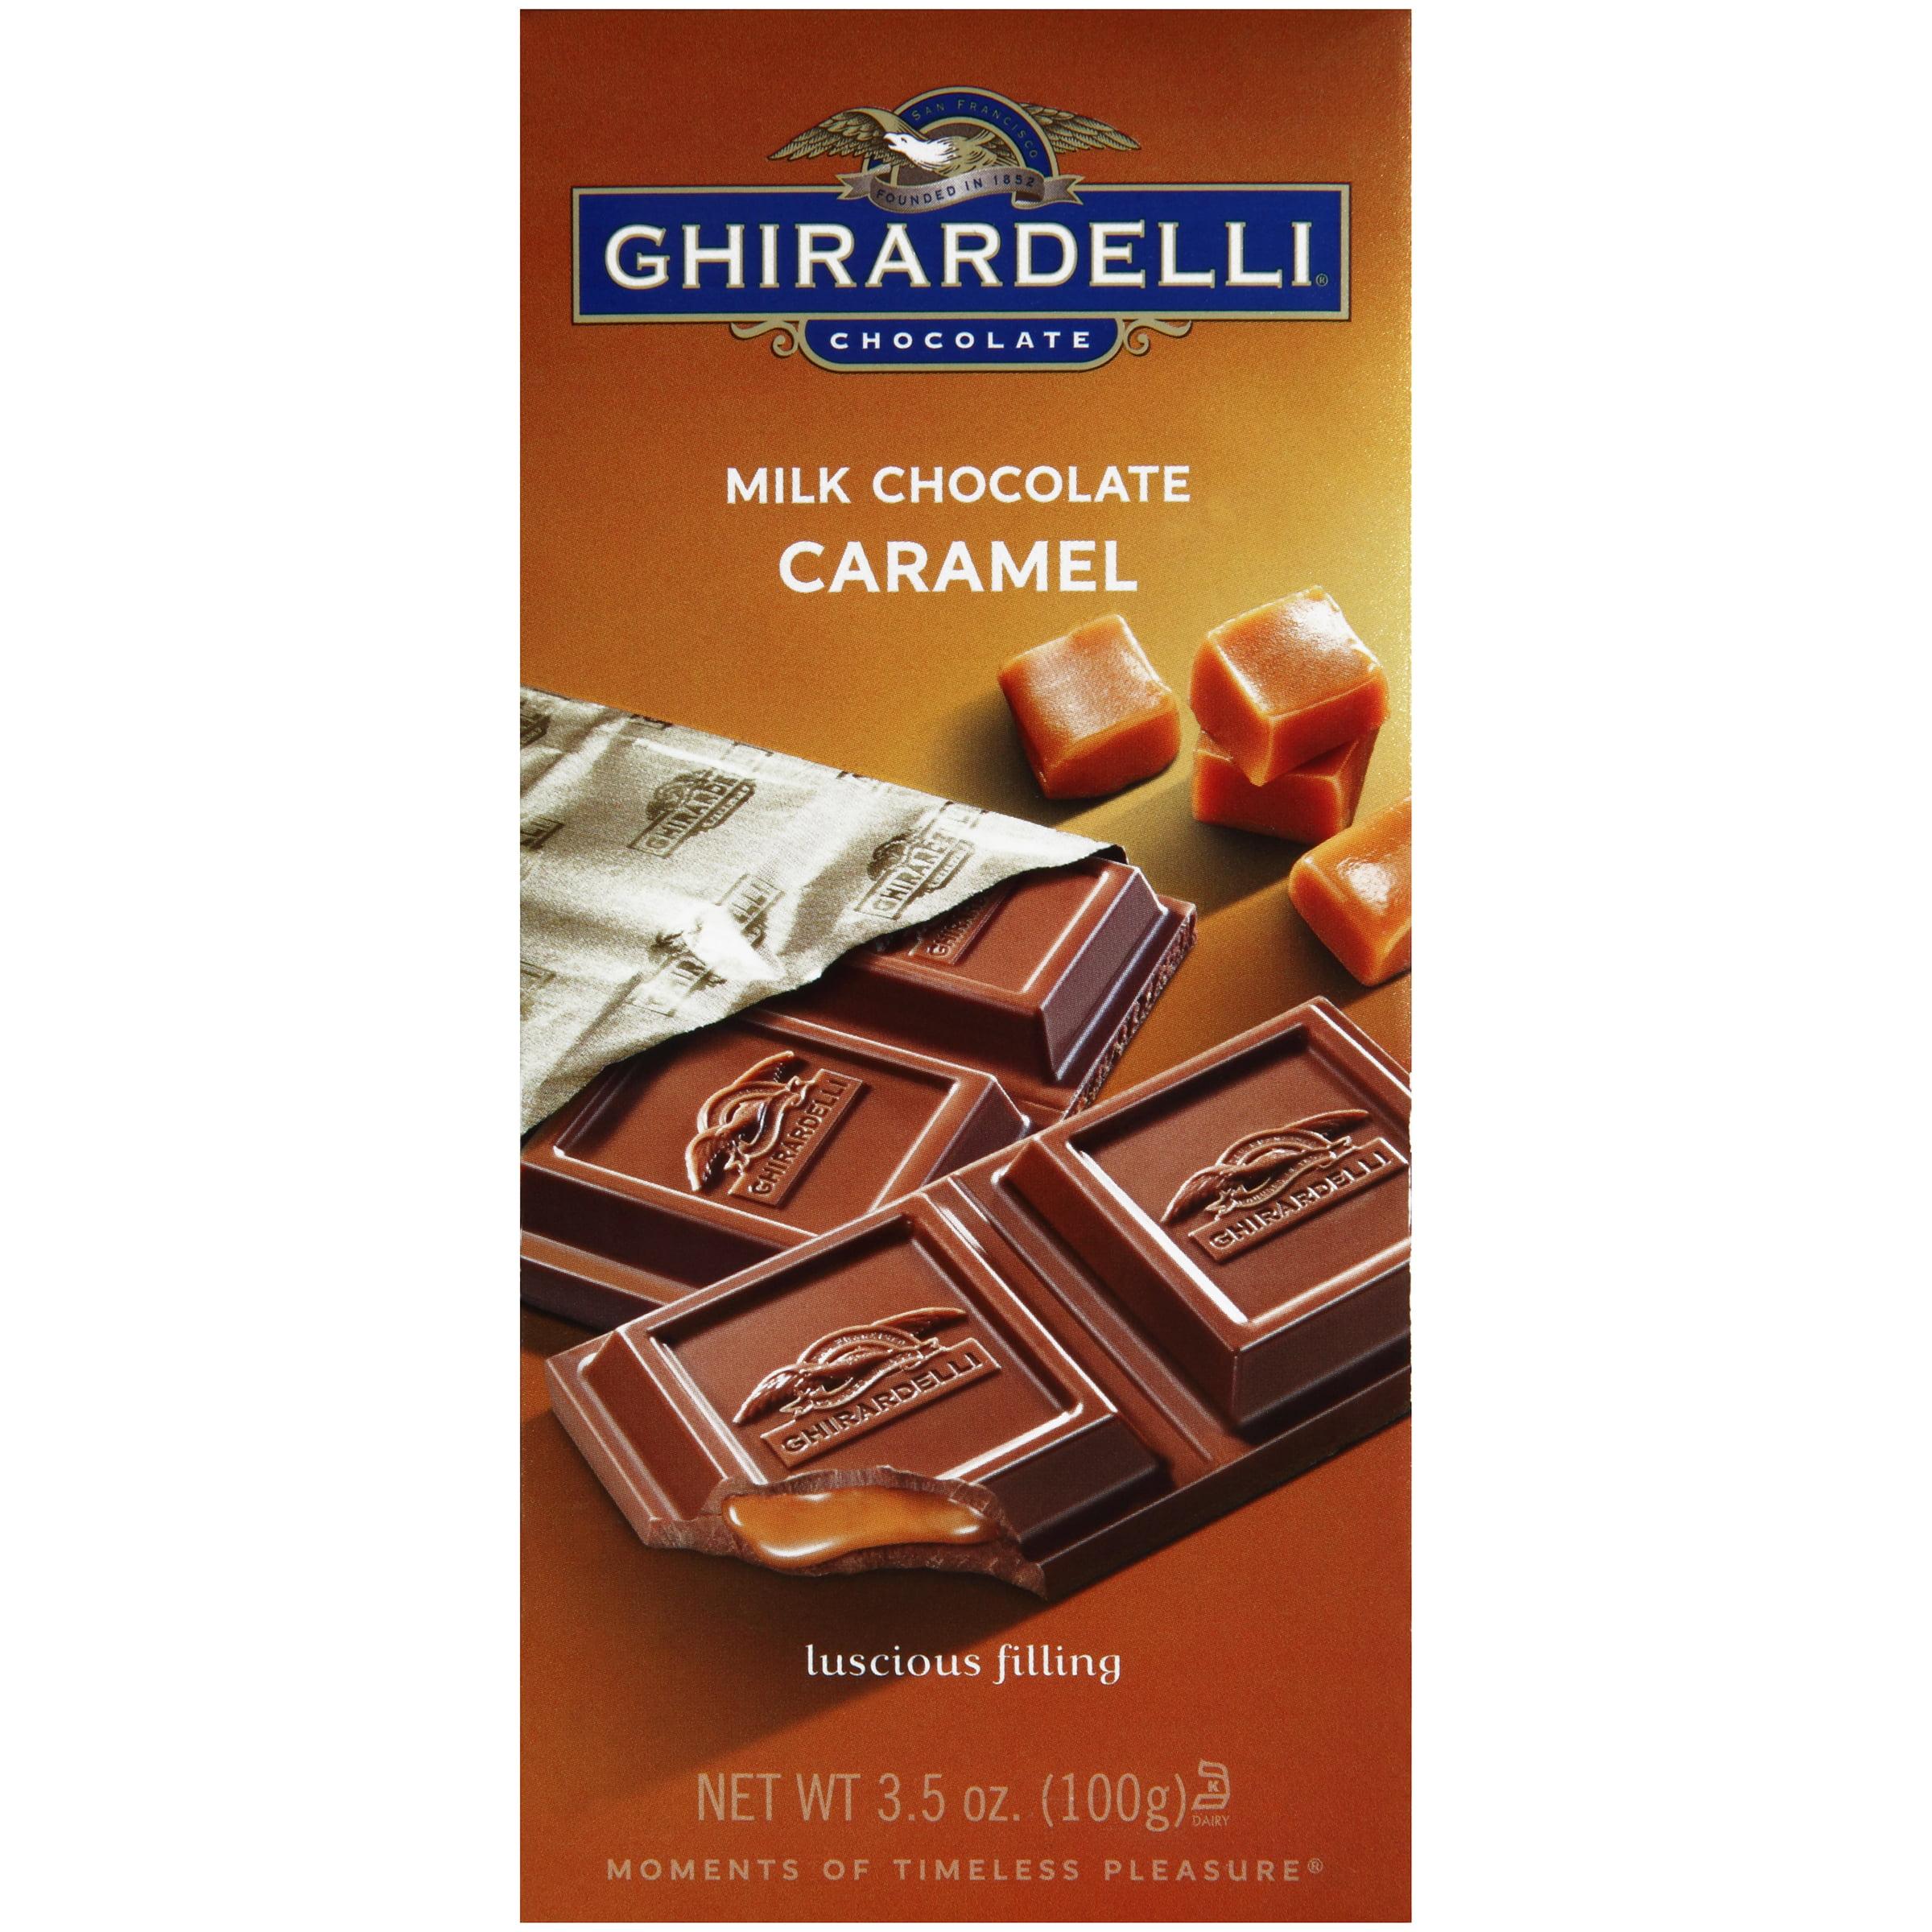 Ghirardelli Chocolate Milk Chocolate Caramel 3.5 oz. Box by Ghirardelli Chocolate Company